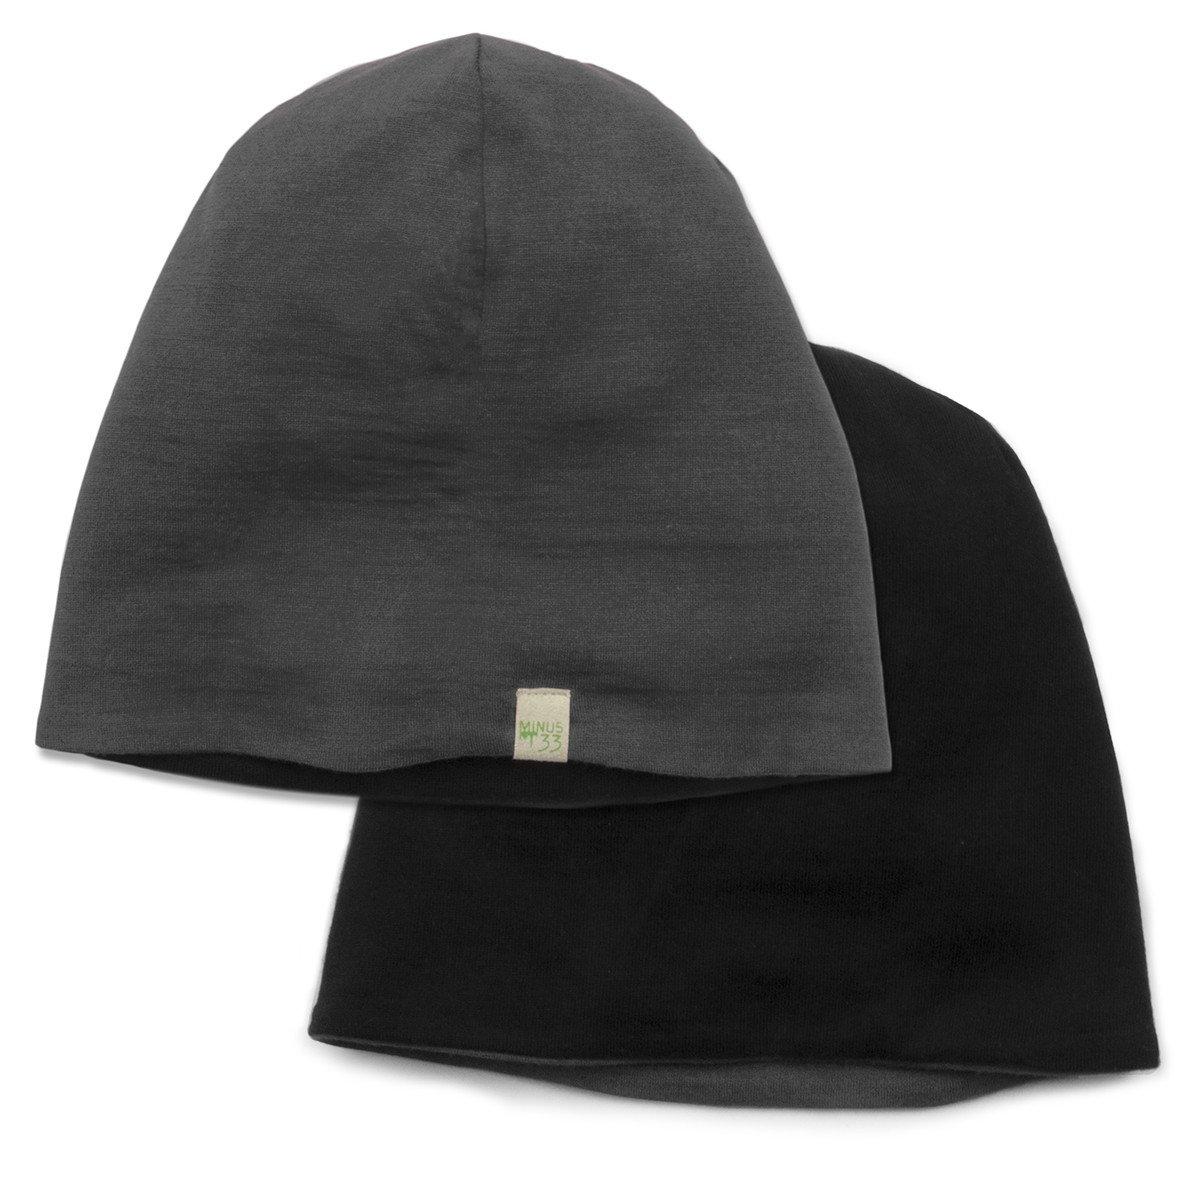 Minus33 Merino Wool Reversible Shade Beanie, Black/Charcoal Grey, One Size